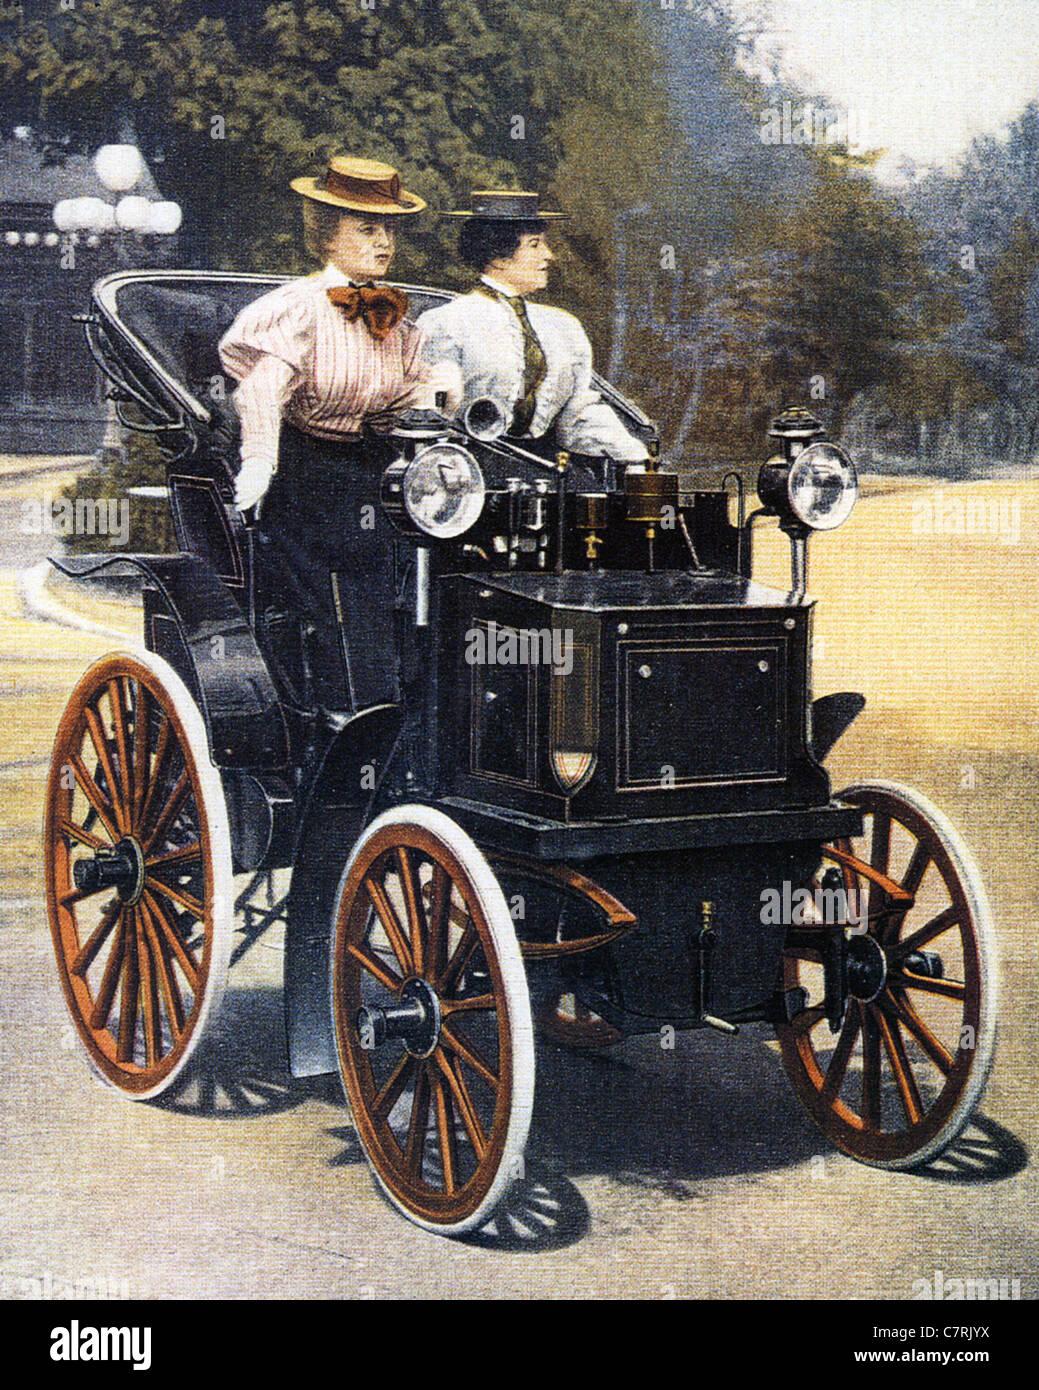 PANHARD ET LEVASSOR Daimler Motor Carriage in 1894 - Stock Image